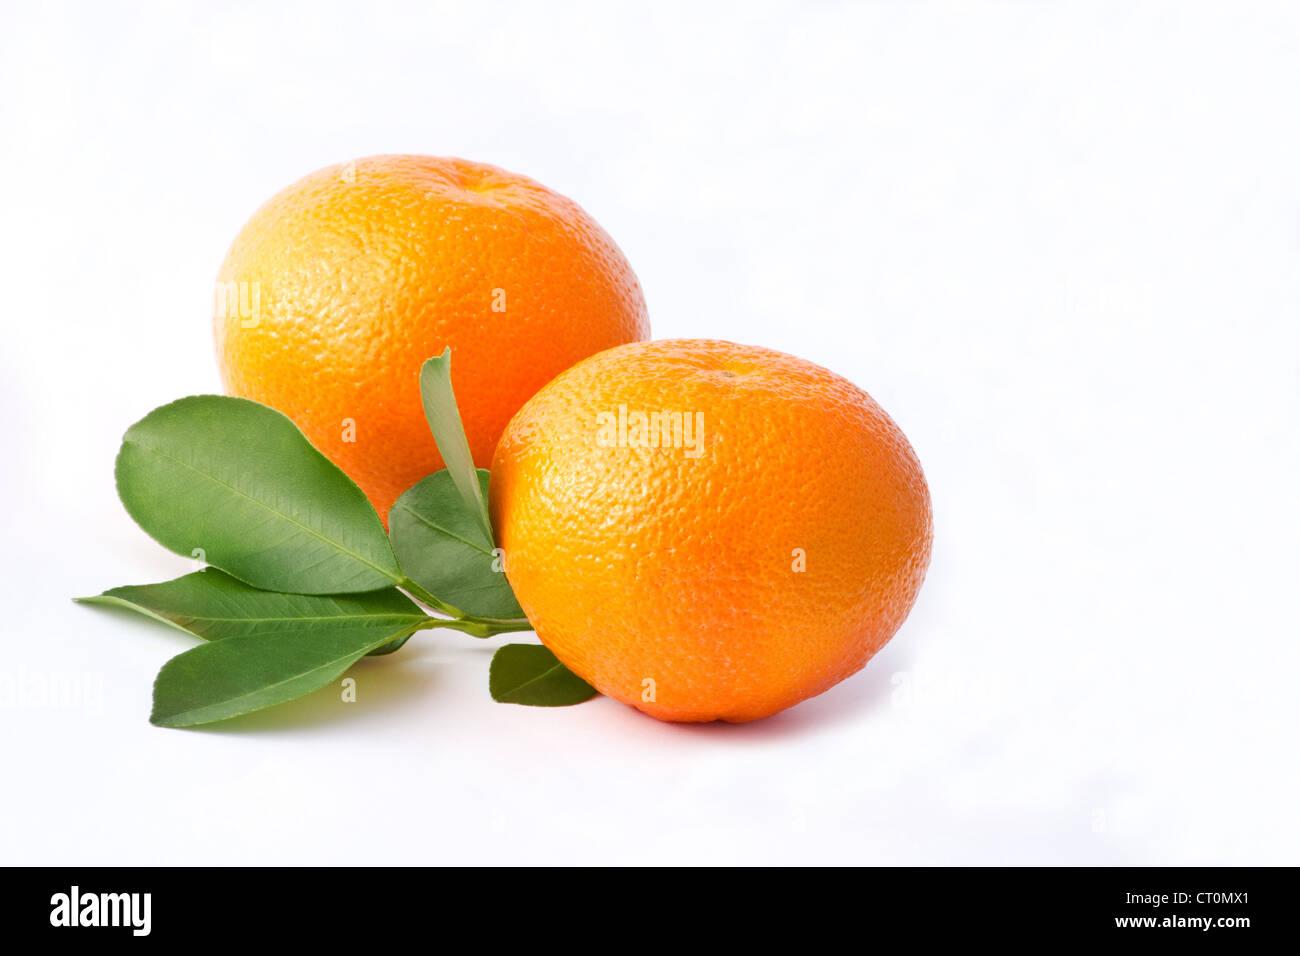 Fresh oranges clementine ((Citrus reticulata) on white background - Stock Image